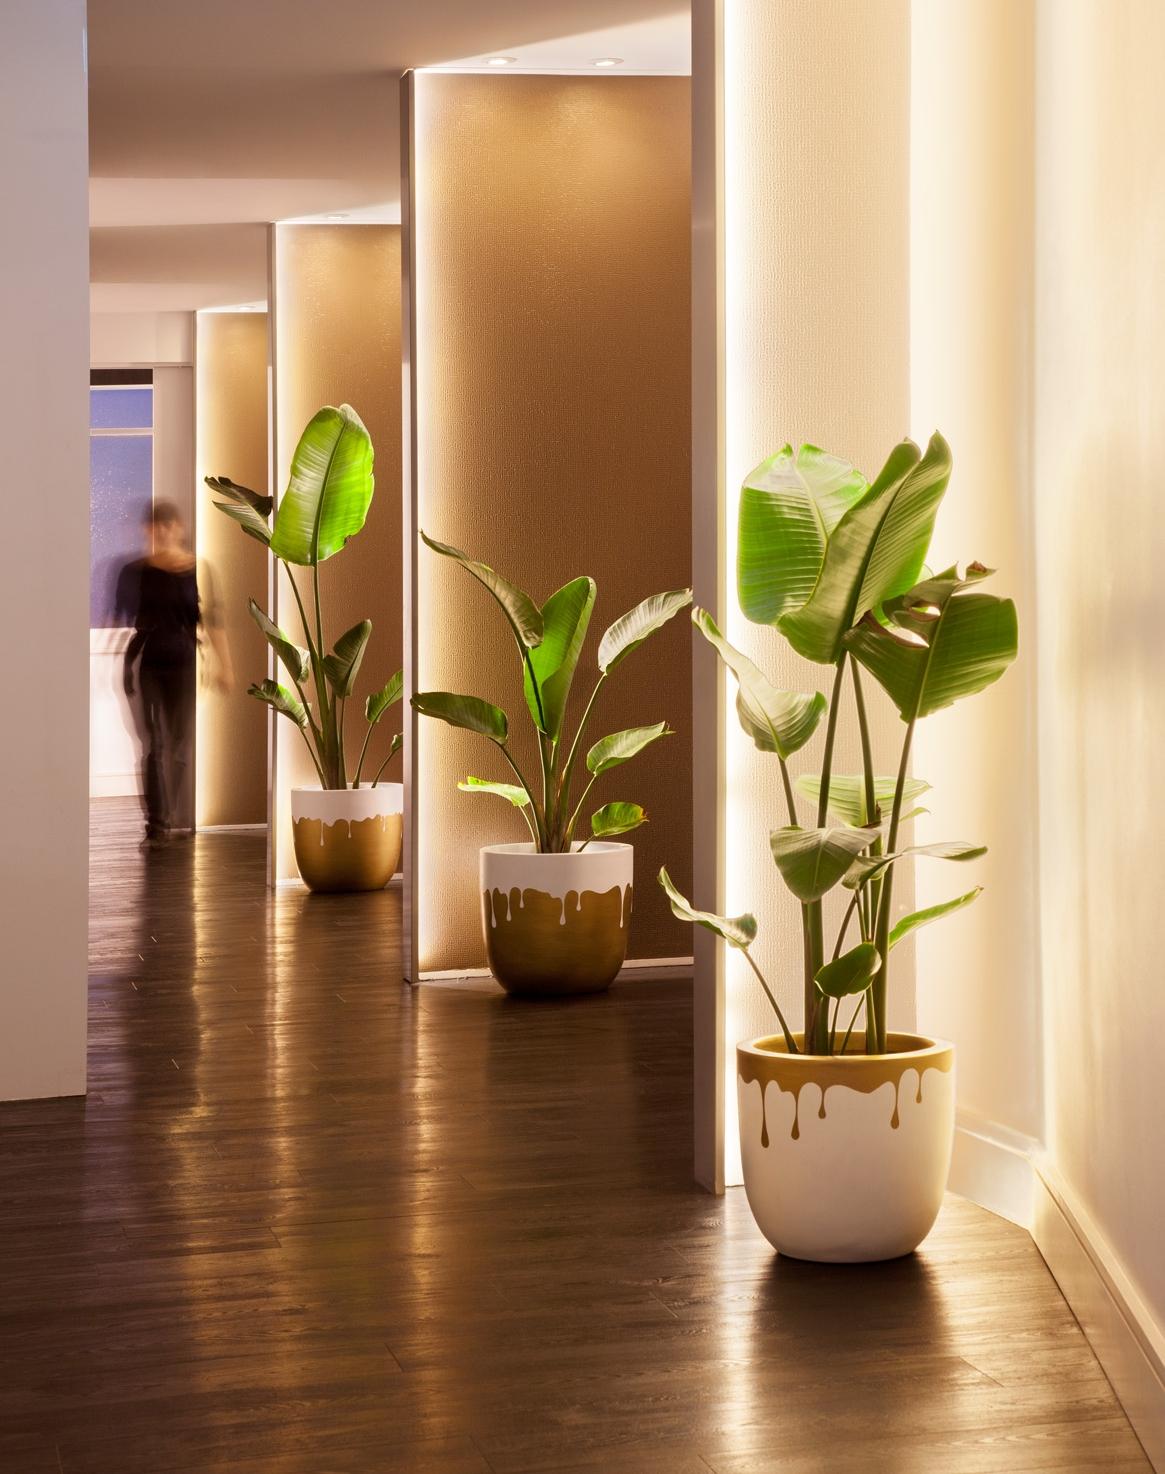 Botanica+Day+Spa_Hallway1.jpg